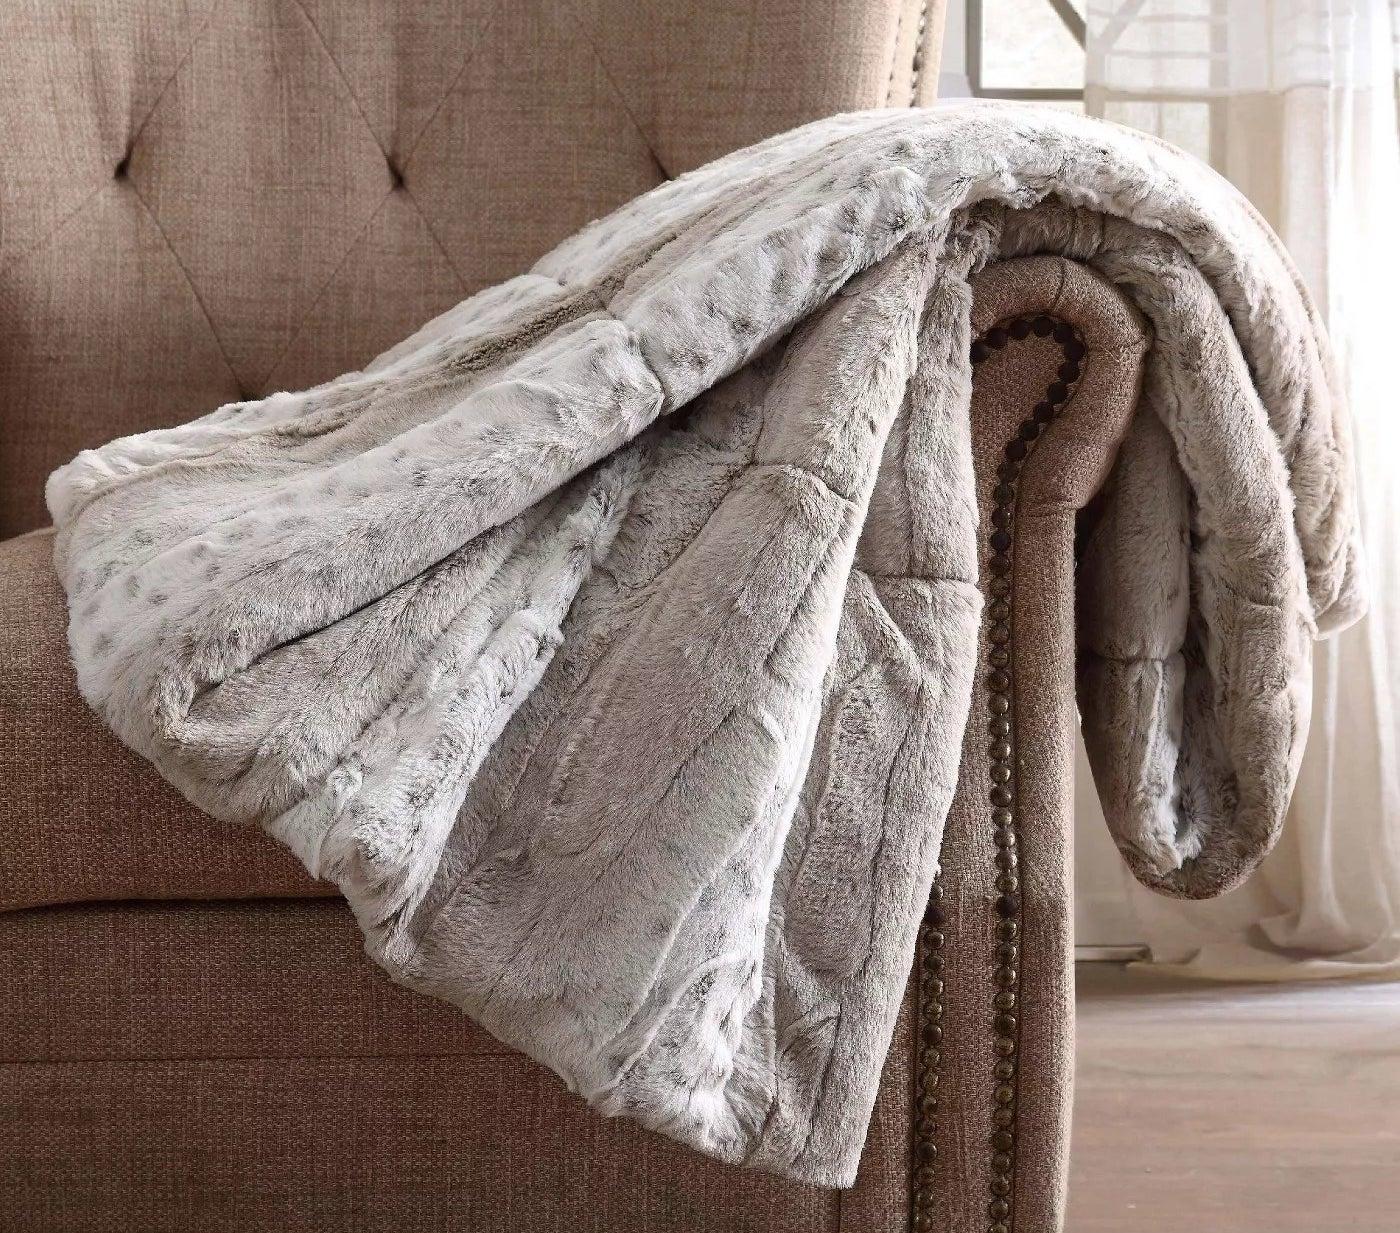 The silver, polyester mink fur reverse blanket